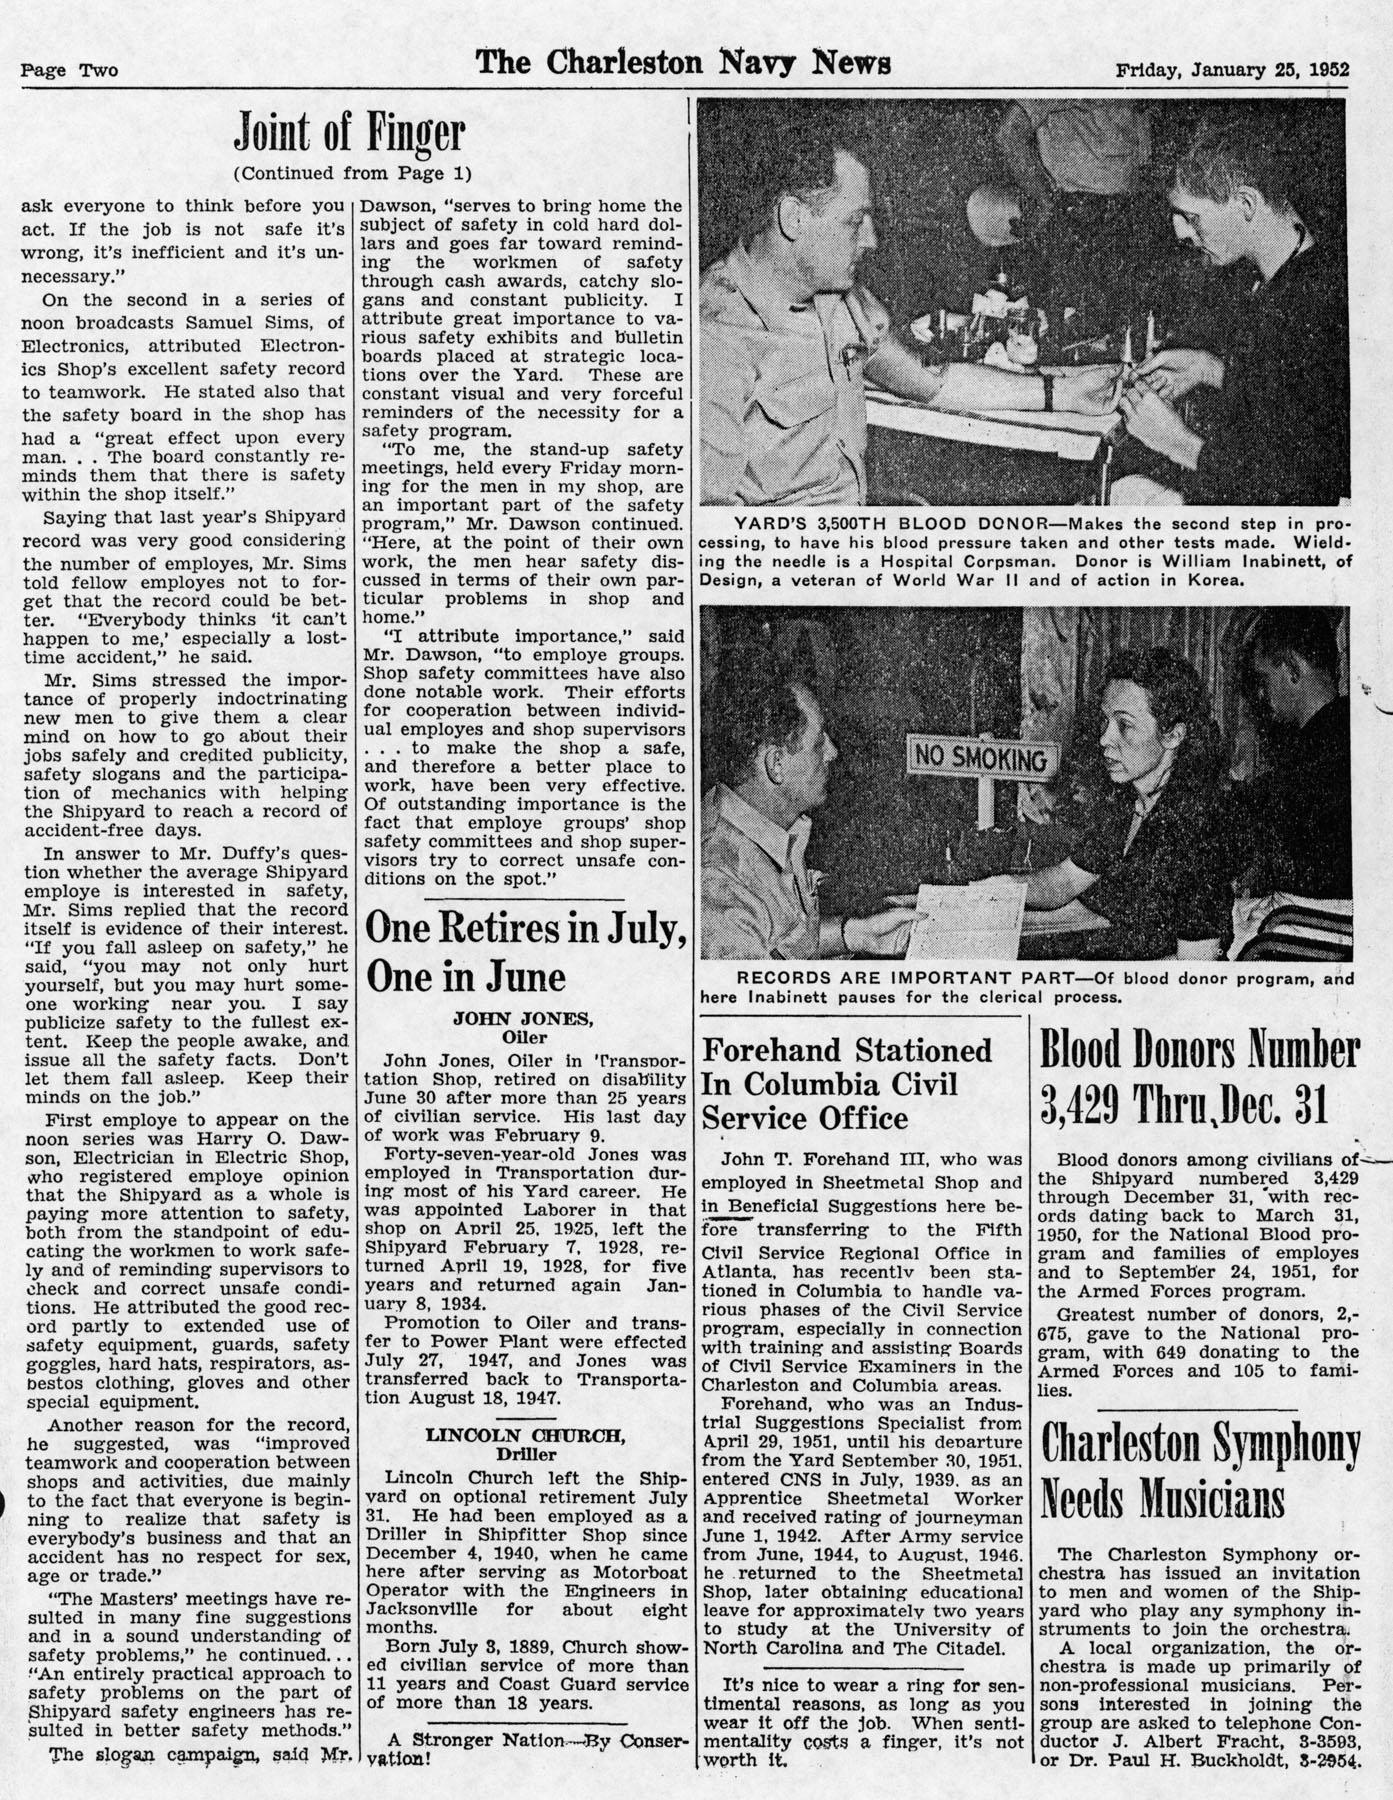 The Charleston Navy News, Volume 10, Edition 13, page ii